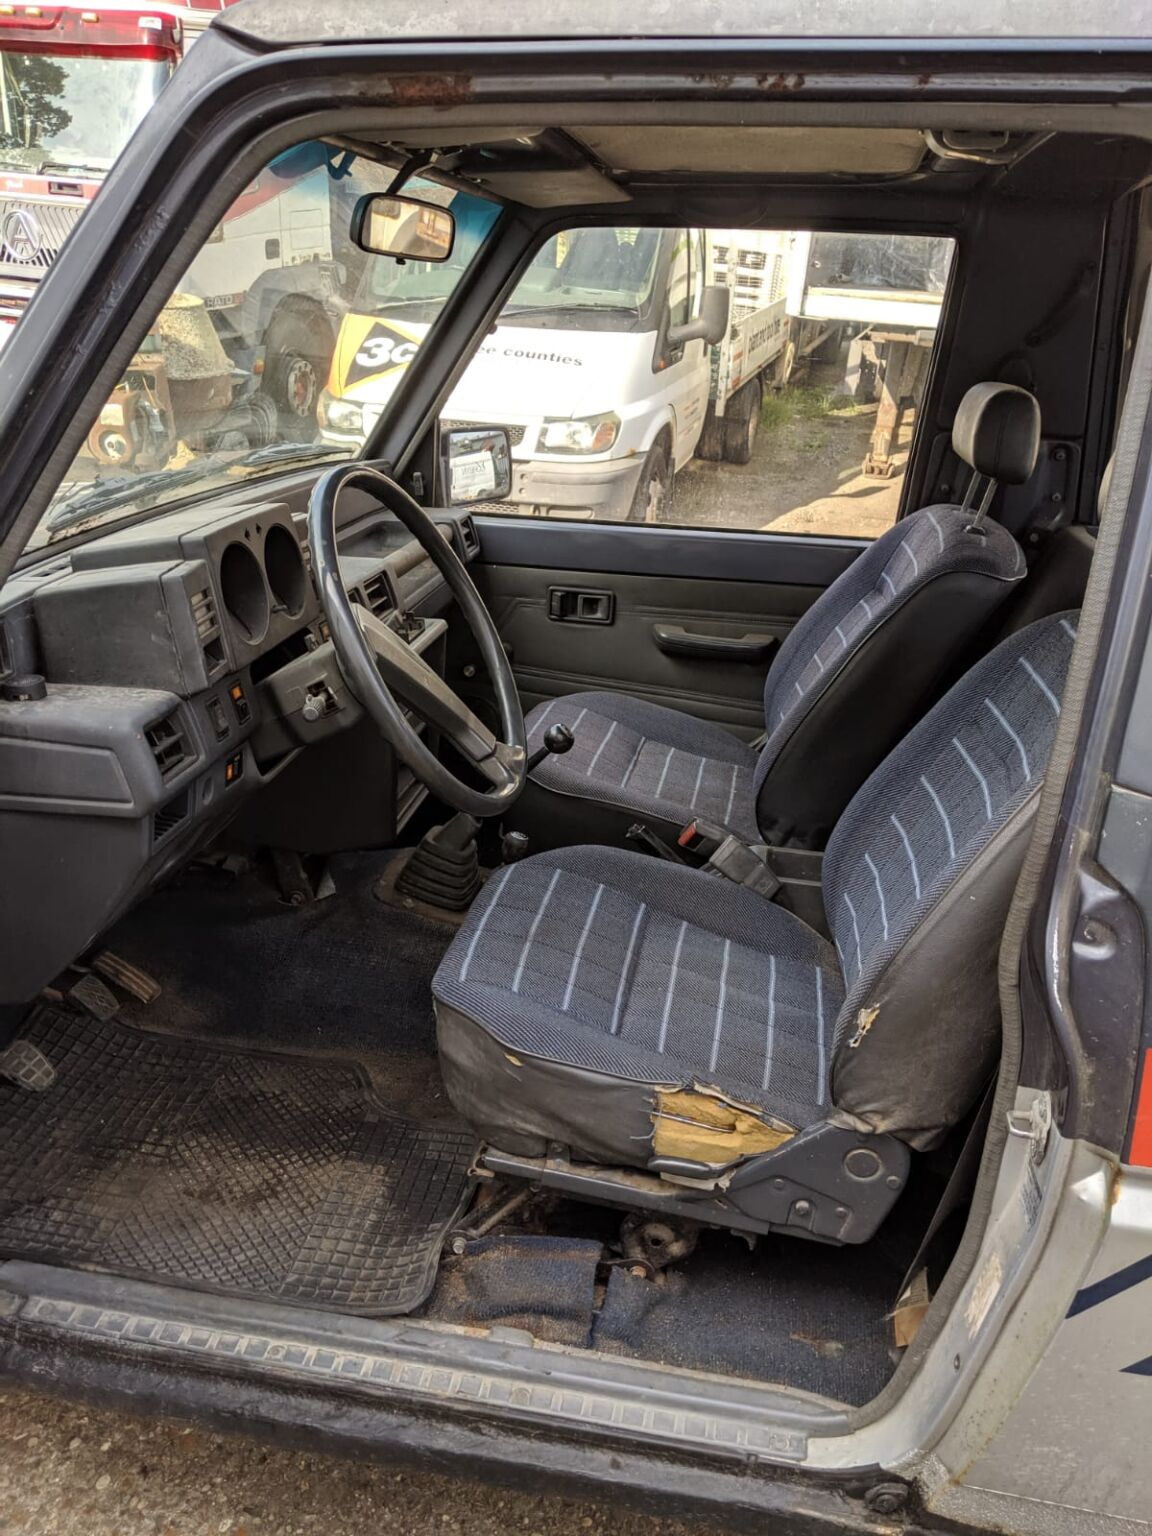 Daihatsu Rocky EX Diesel Turbo, SWB 4 x 4 Jeep